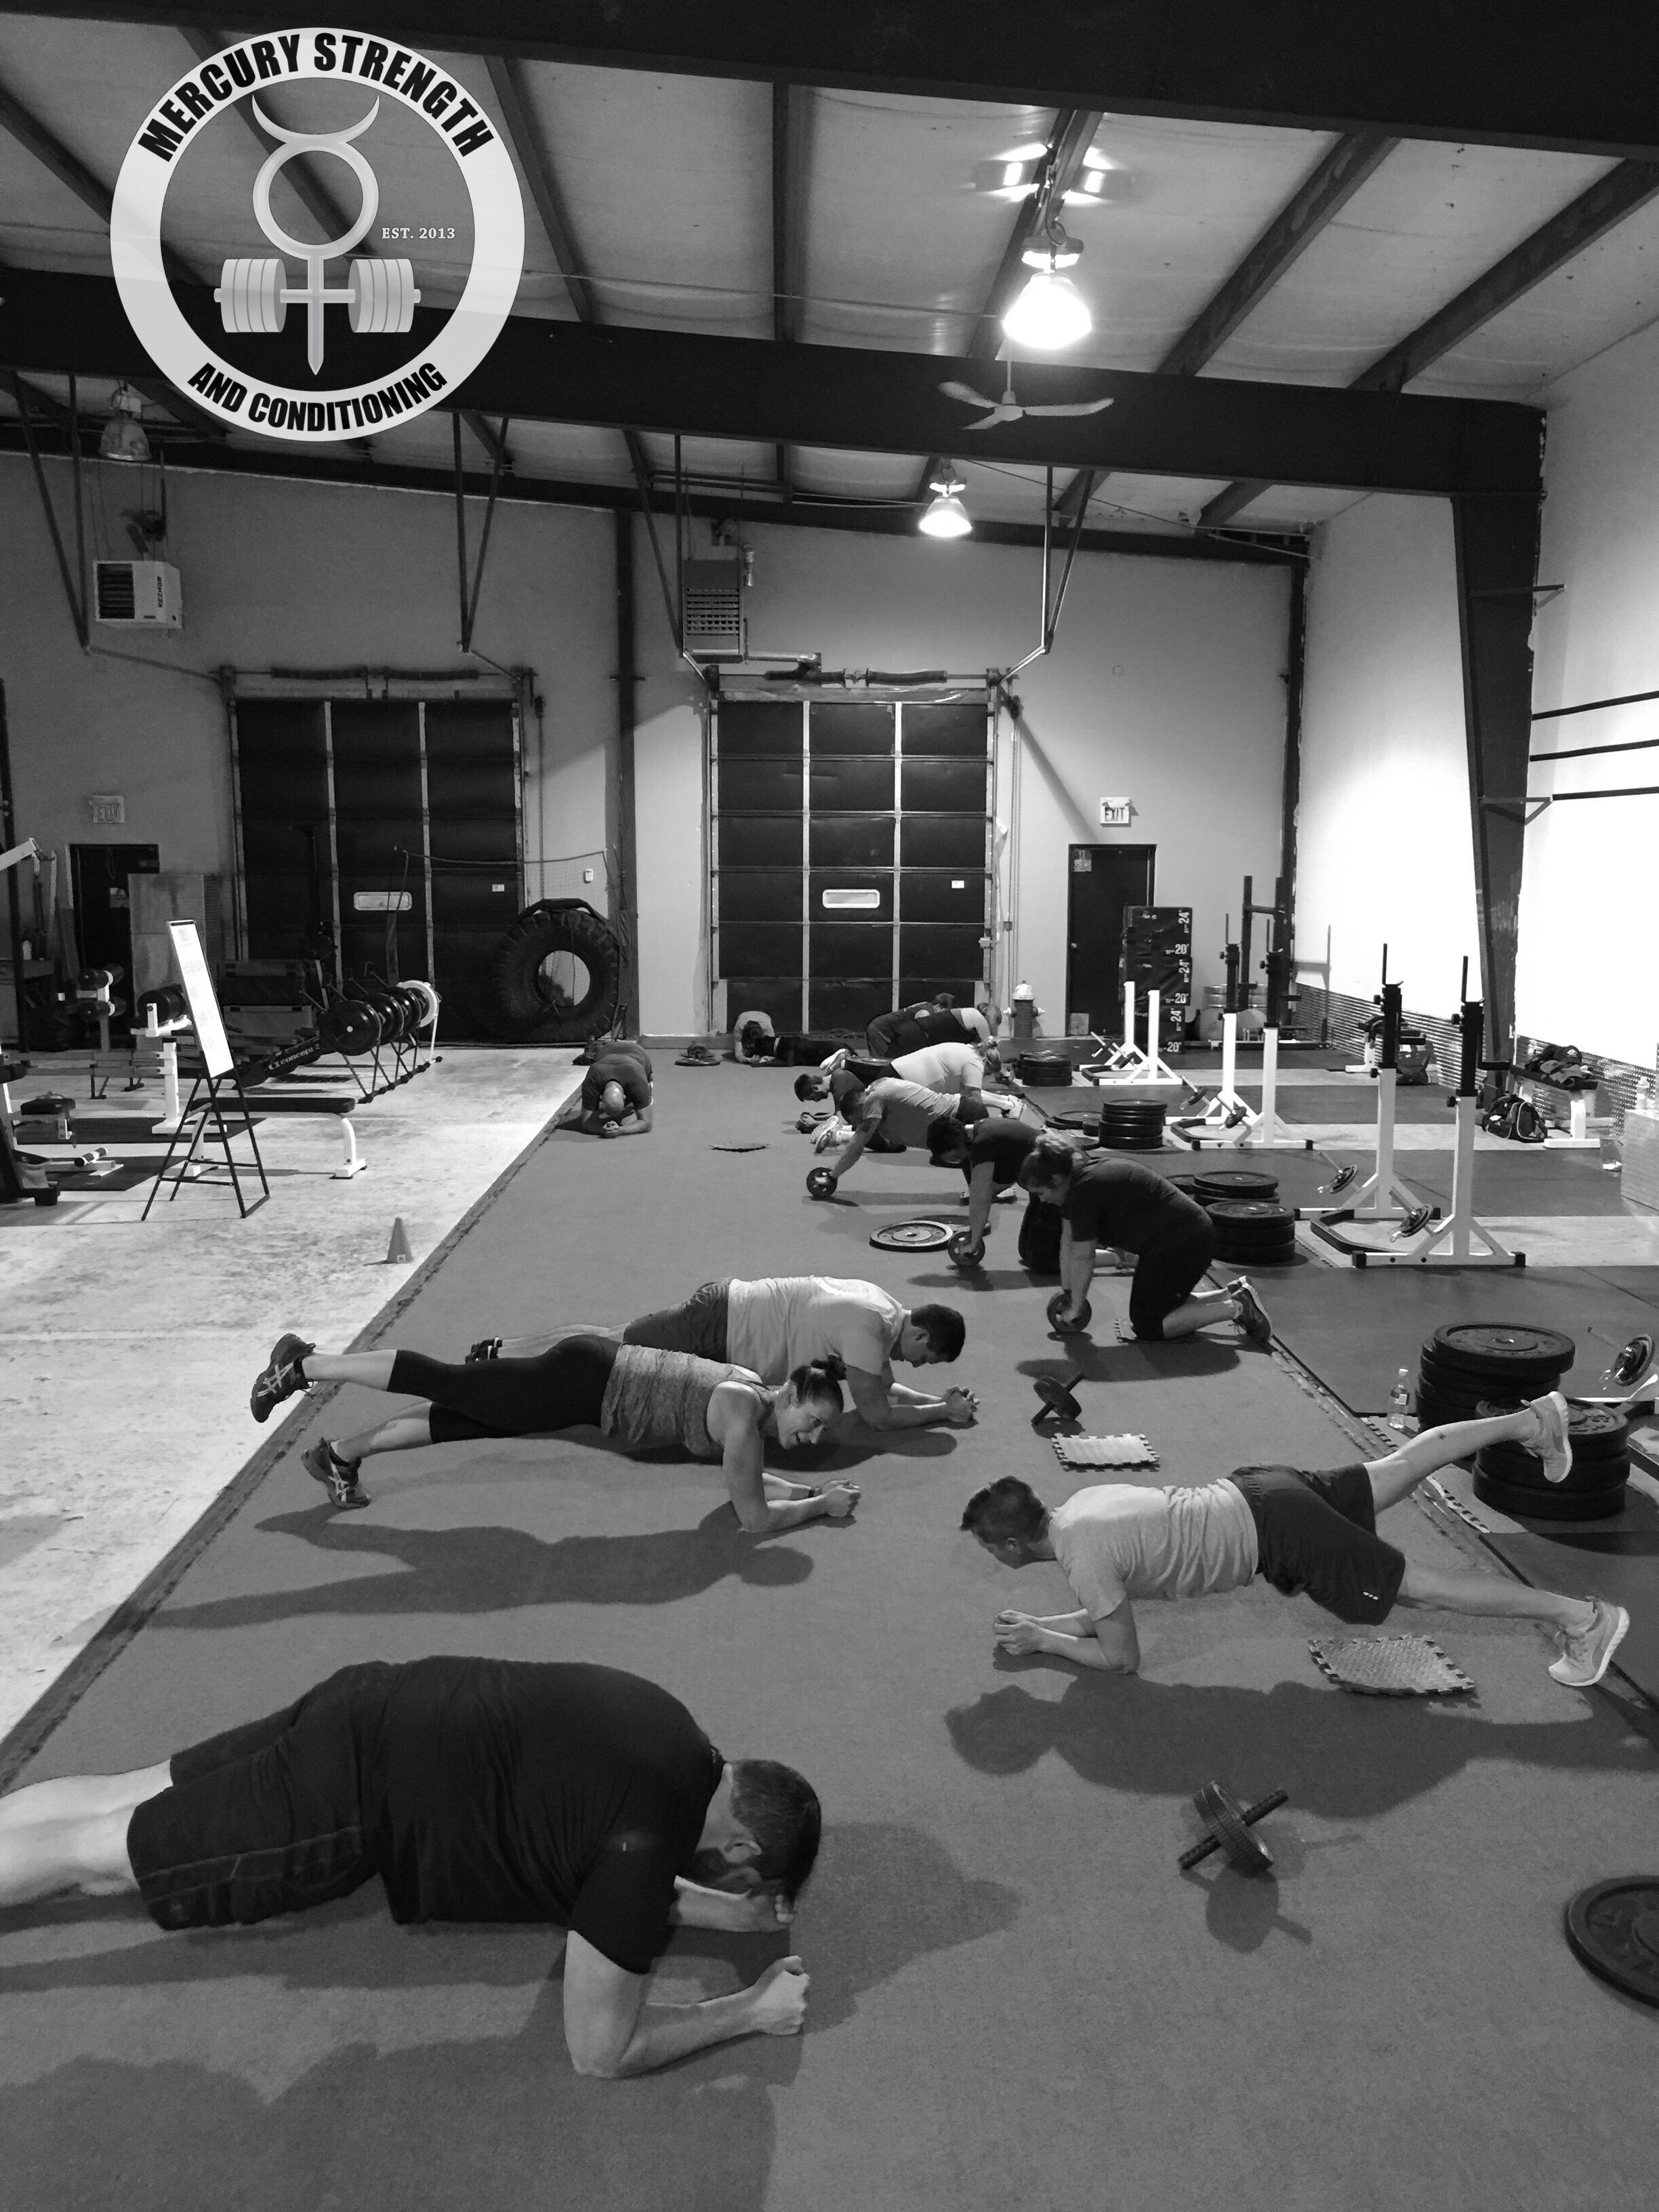 Gym-powerlifting-Olympic lifting-fitness-personal training-training-bootcamp-crossfit-kingston-kingston gym-kids-mercury-strength-conditioning-athlete-ab wheel-plank